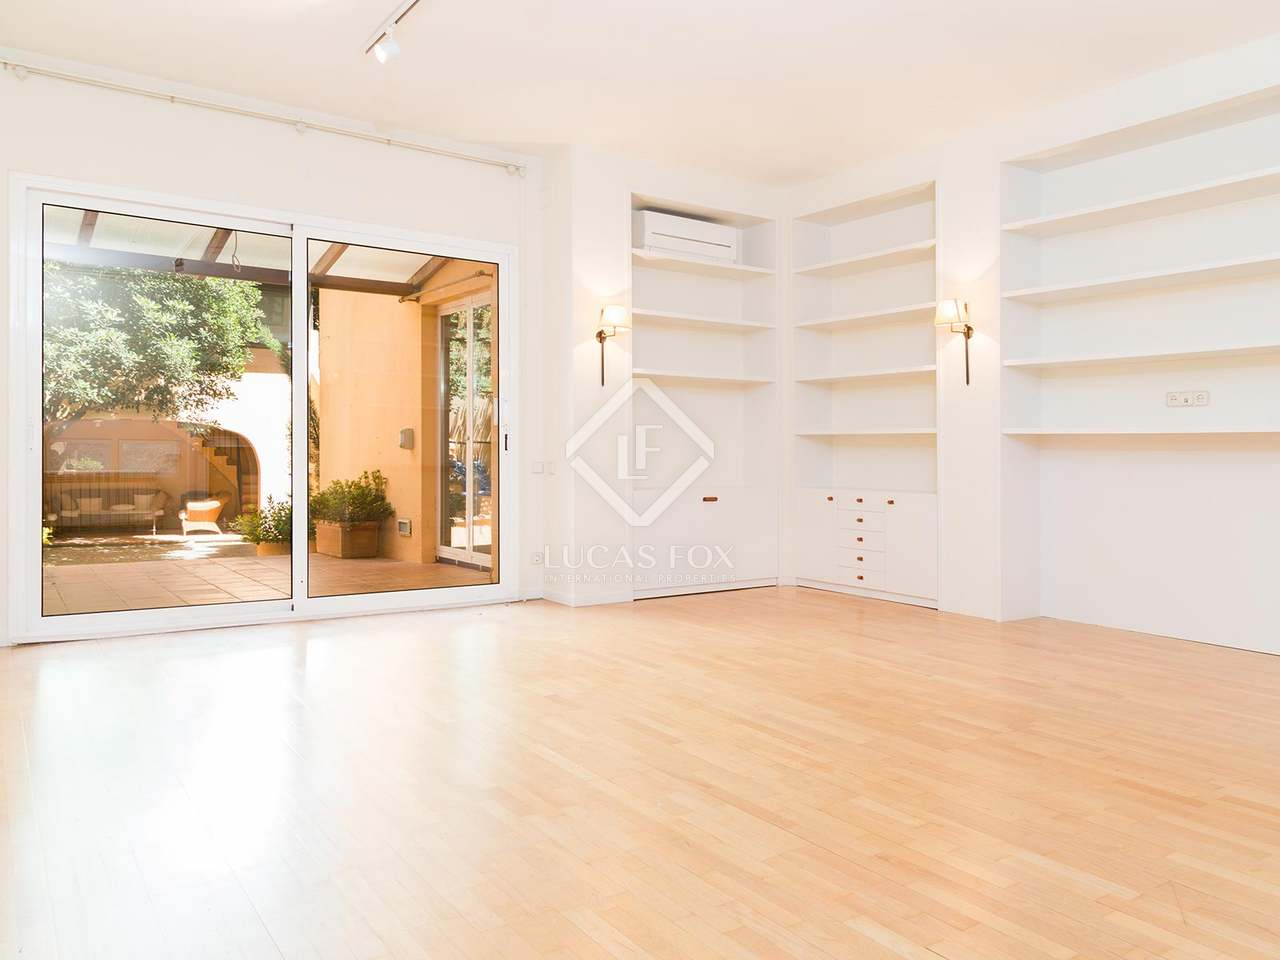 House with a garden for rent in sarri zona alta barcelona - Zona alta barcelona ...